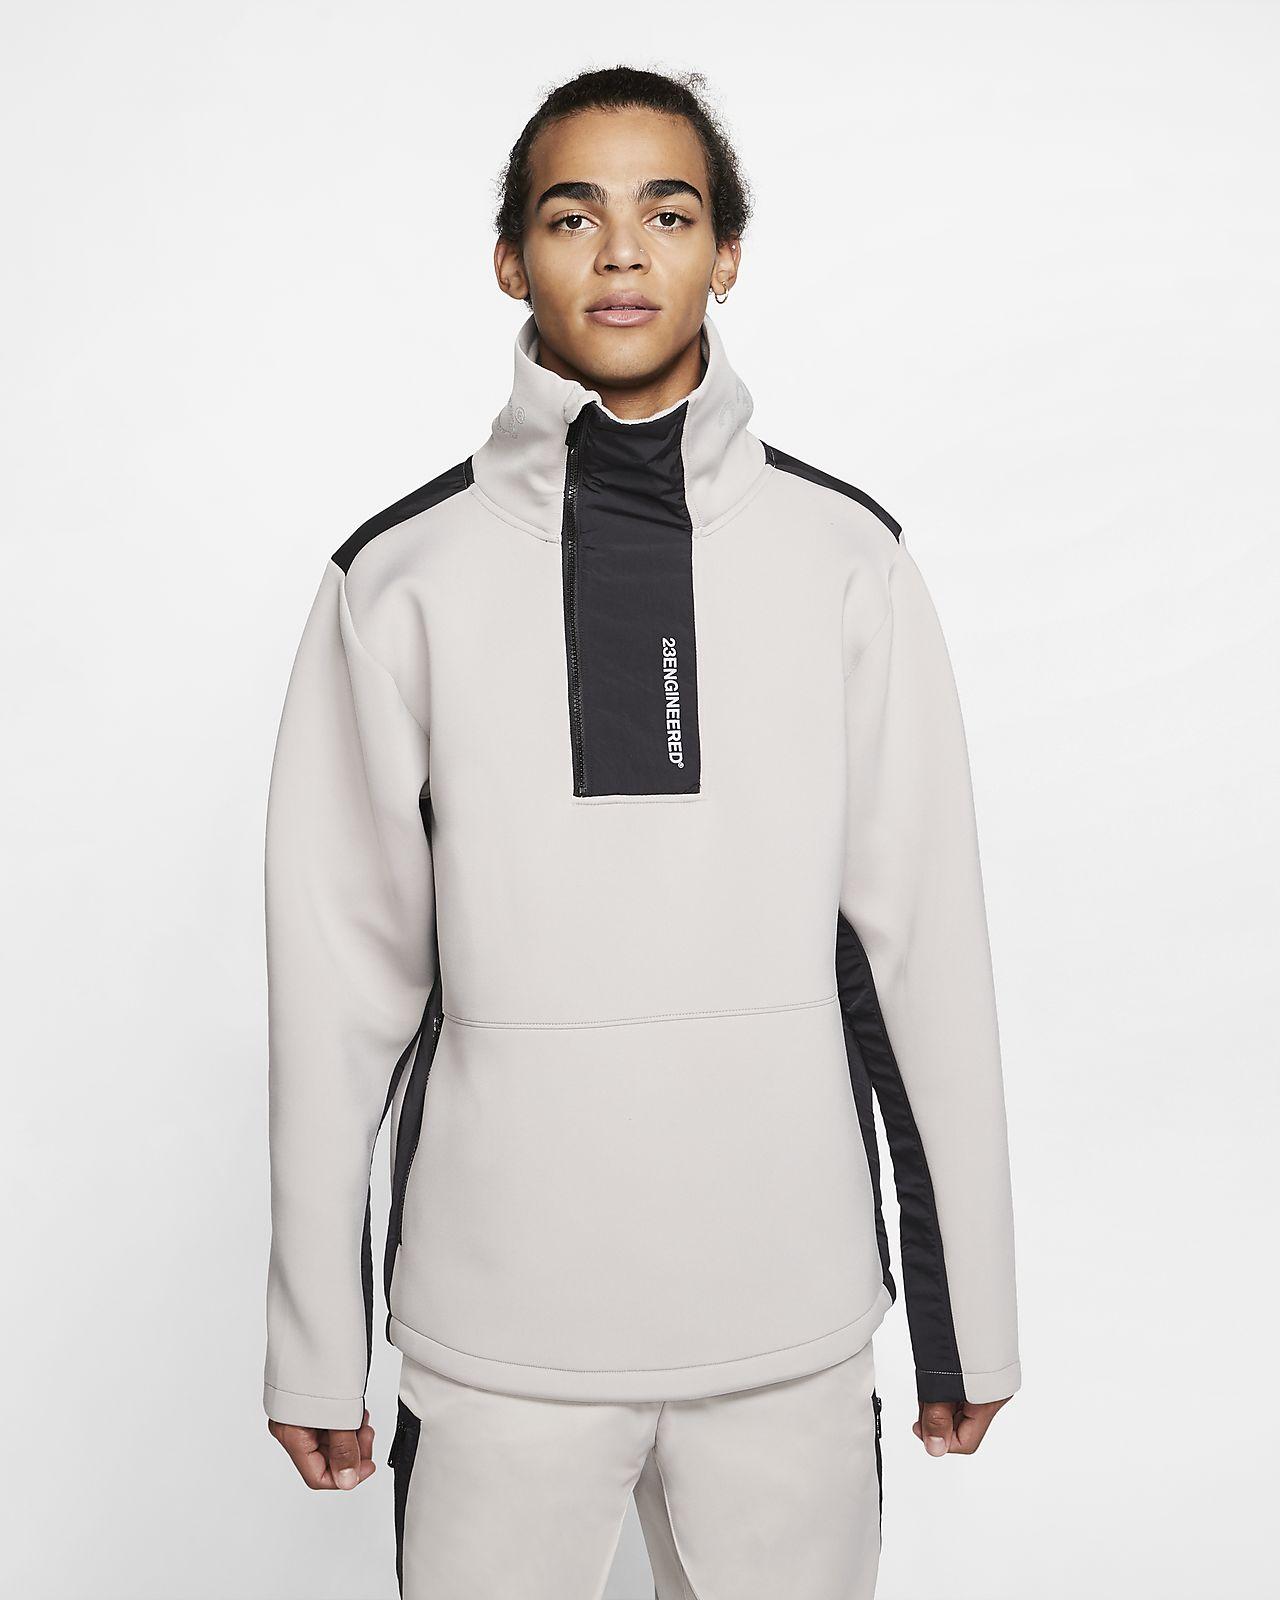 Jordan 23 Engineered Fleece Mock-Neck Sweatshirt